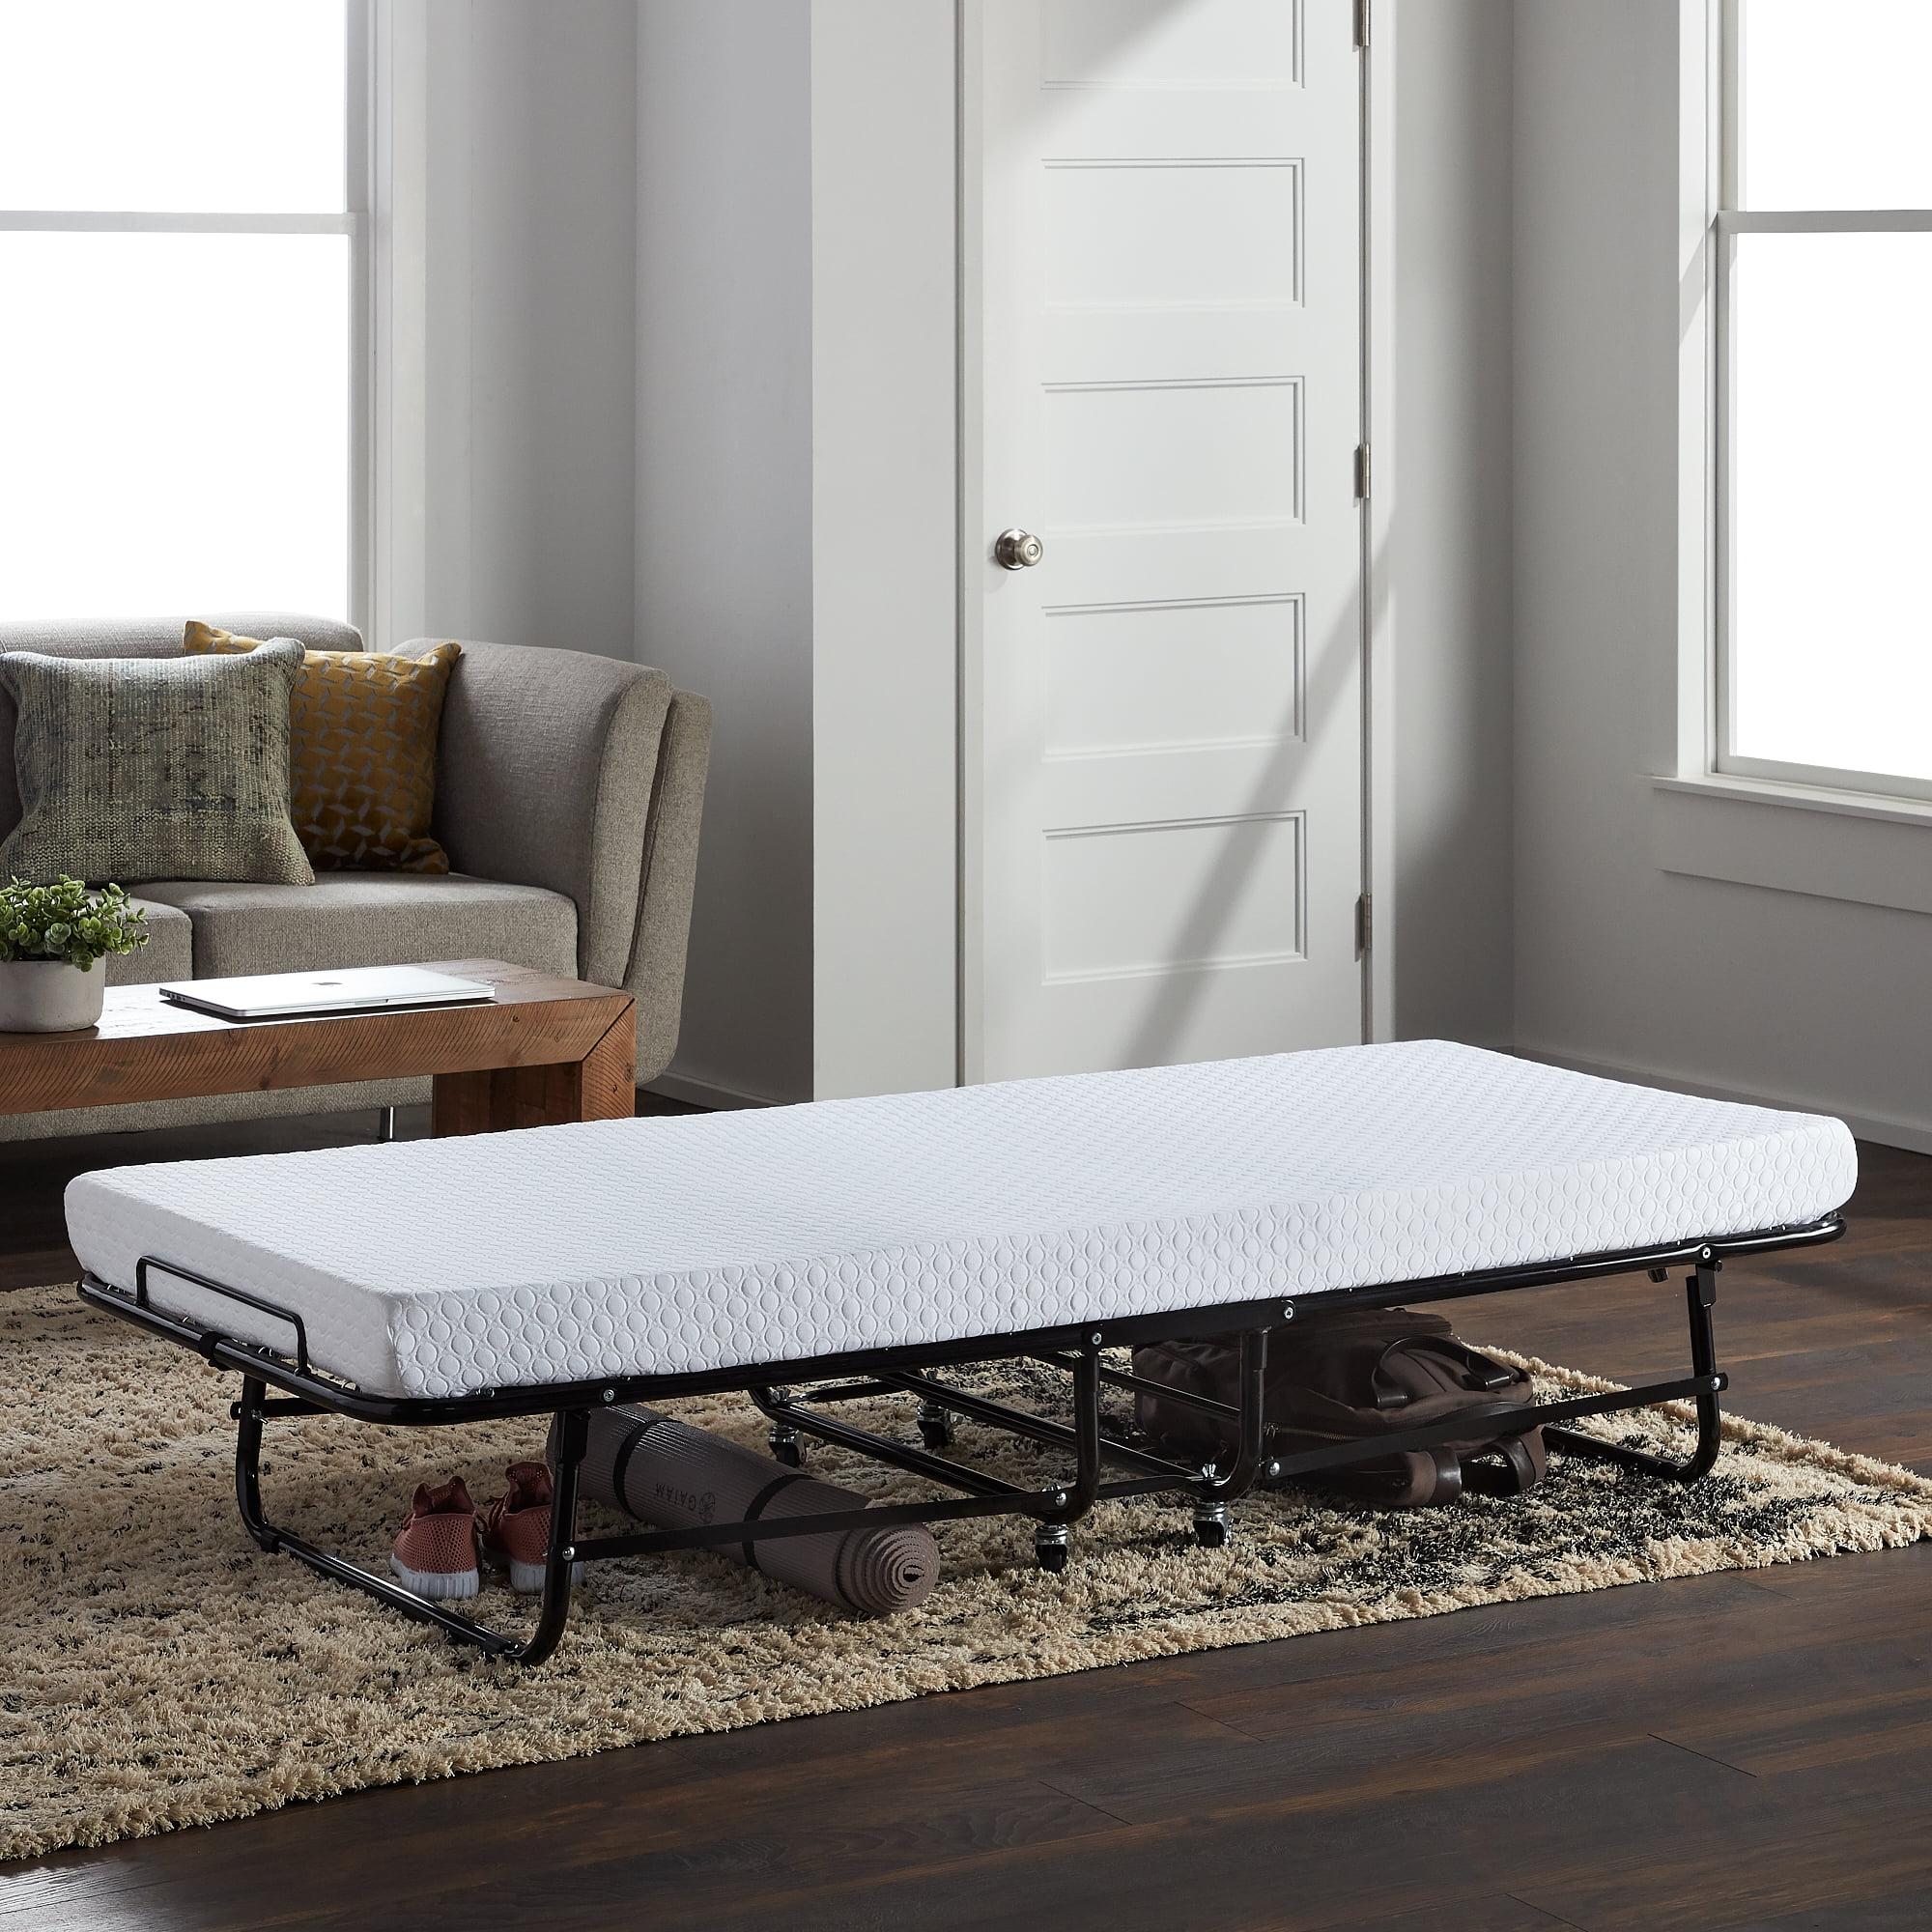 Lucid Rollaway Folding Guest Bed With Memory Foam Mattress